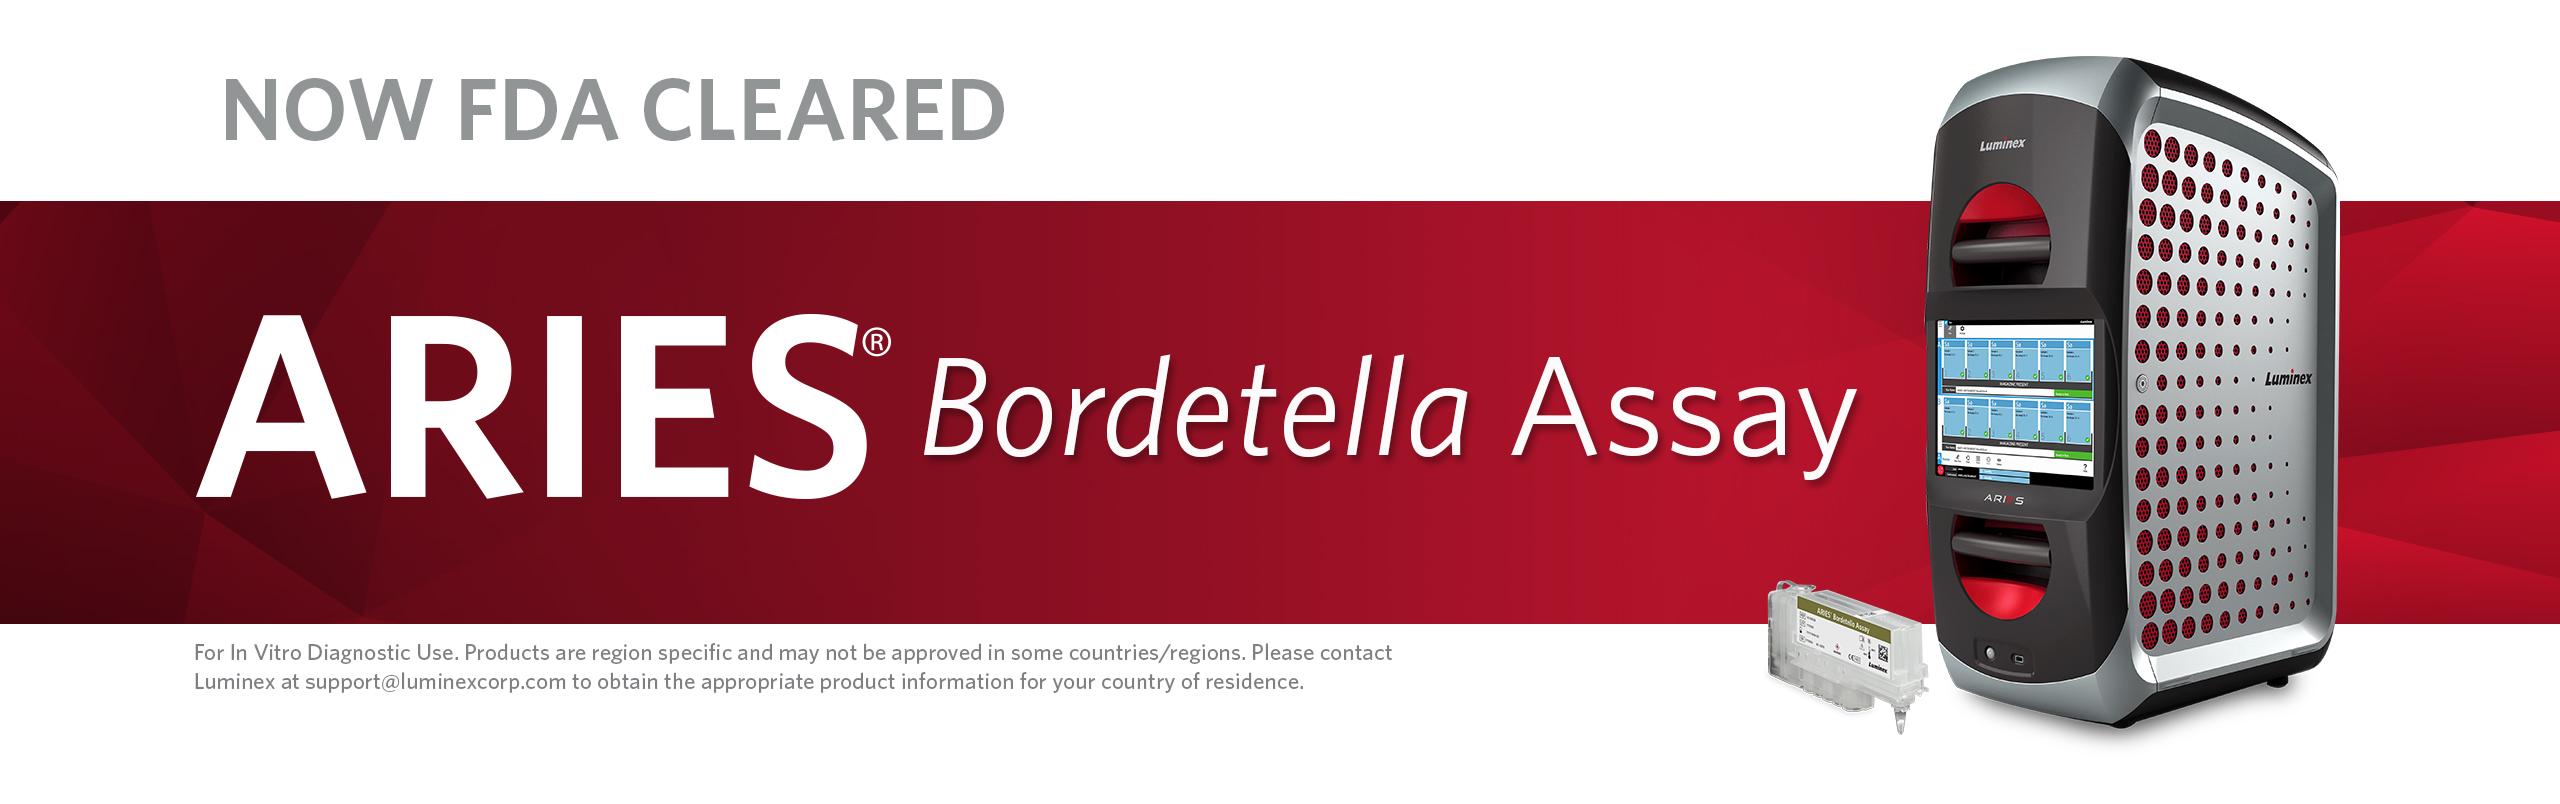 Now FDA Cleared: ARIES® Bordetella Assay